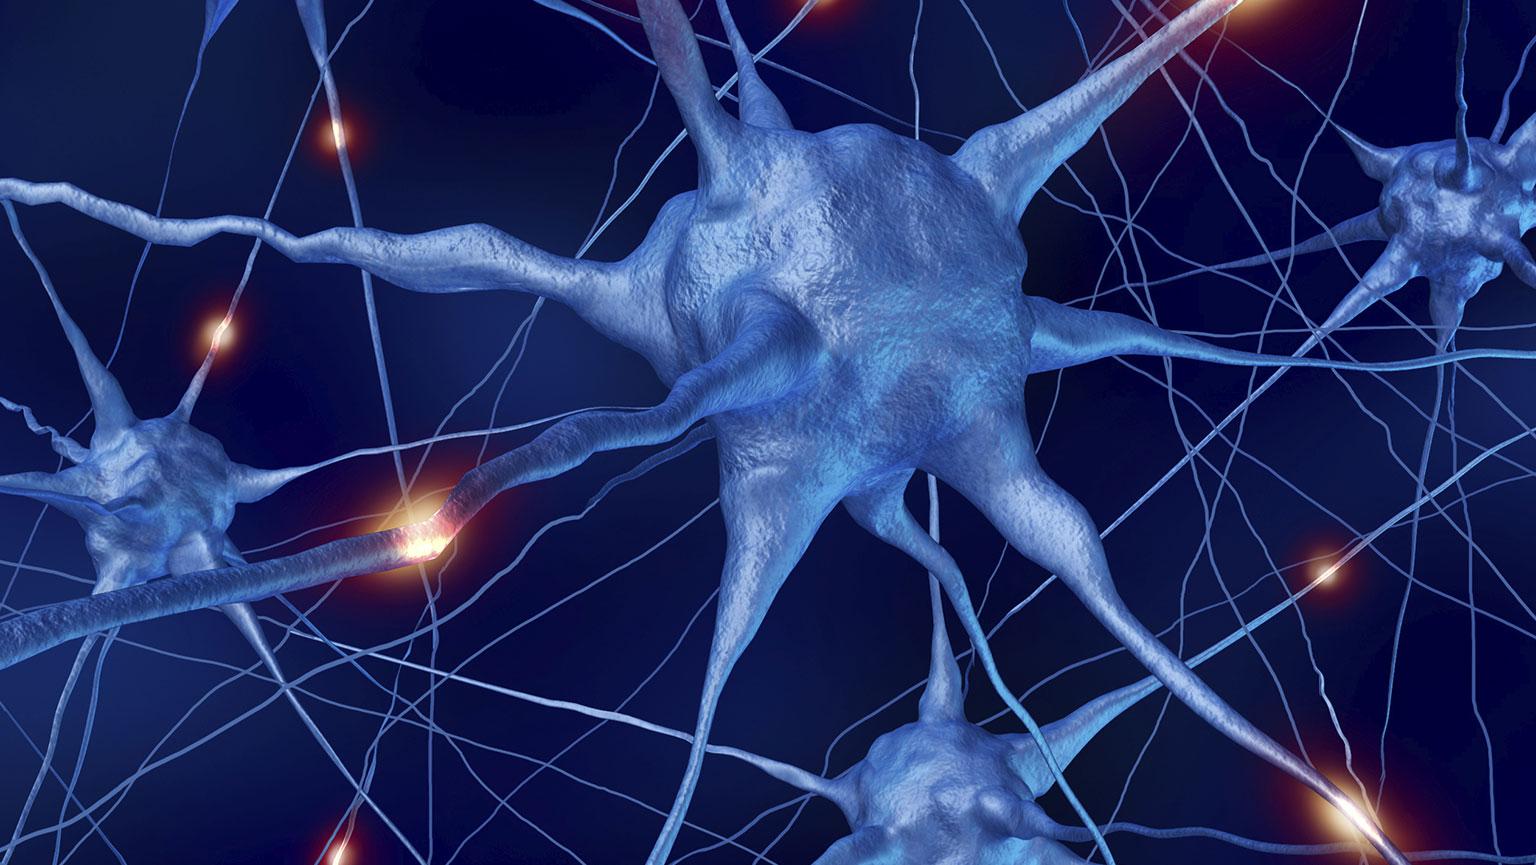 Nervous System—Autonomic Nervous System and Cranial Nerve | The ...